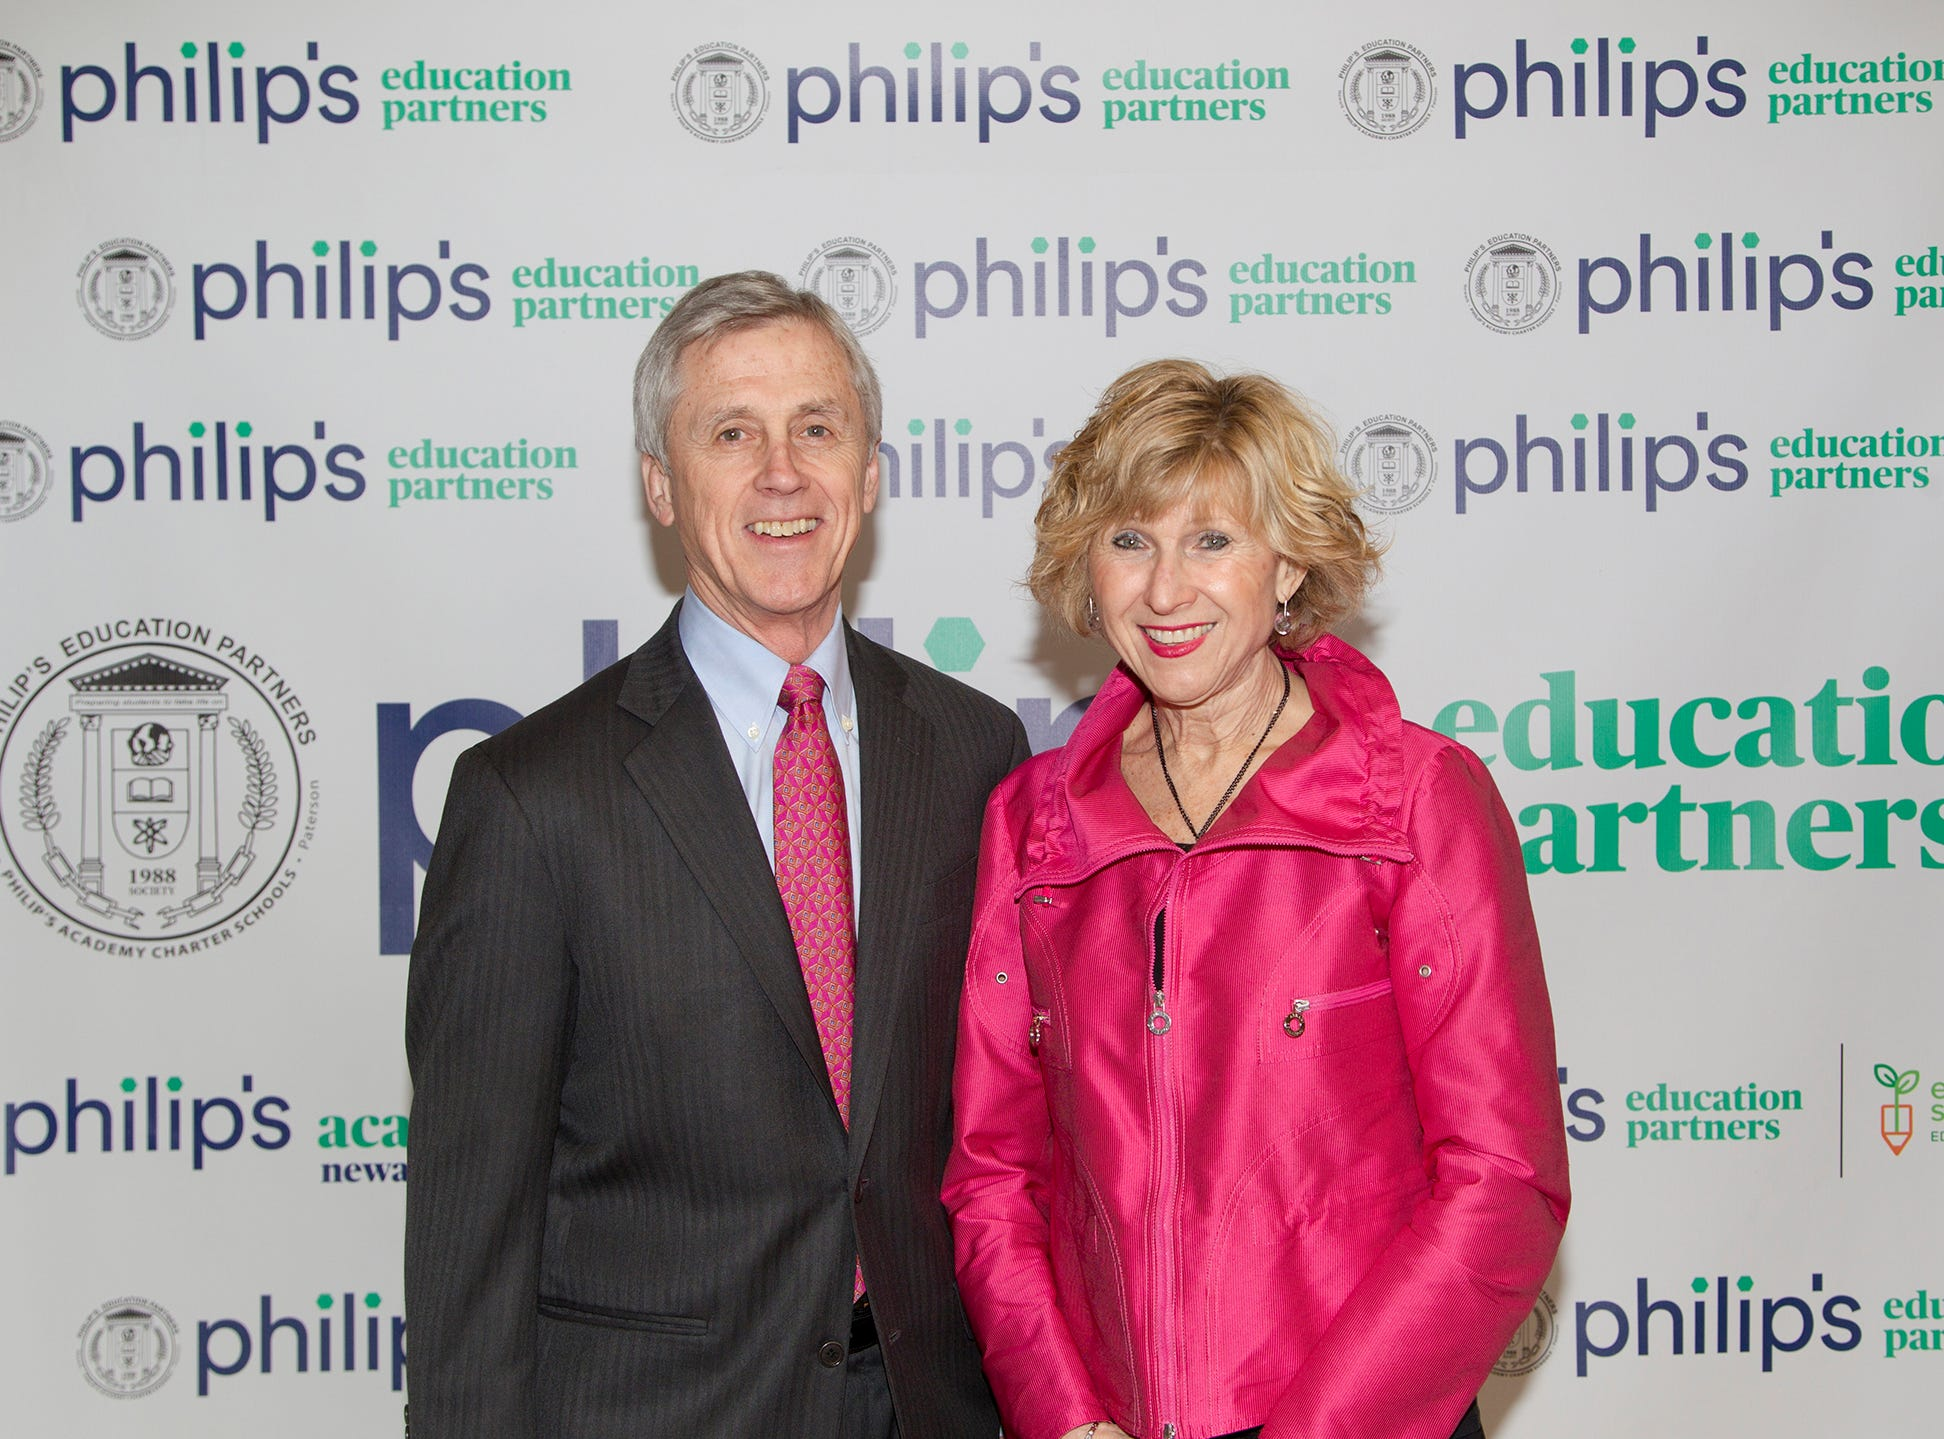 Chris and Bea Daggett. Philip's Education Partners host The Dream Maker 30th anniversary gala at The Mezzanine in Newark 3/29/2019.